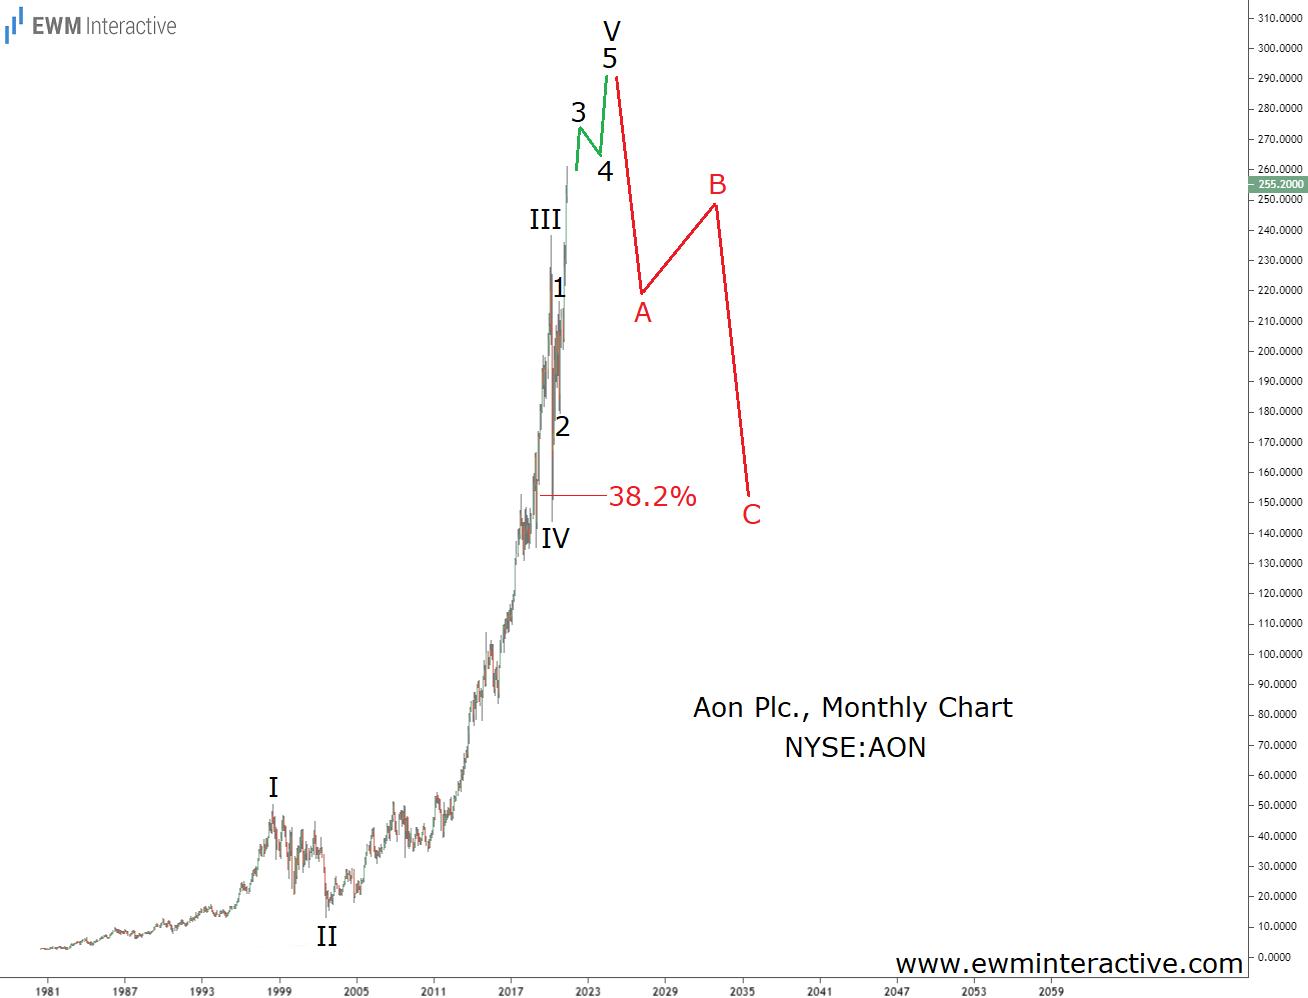 Berkshire 's Aon stock to complete Elliott Wave impulse pattern